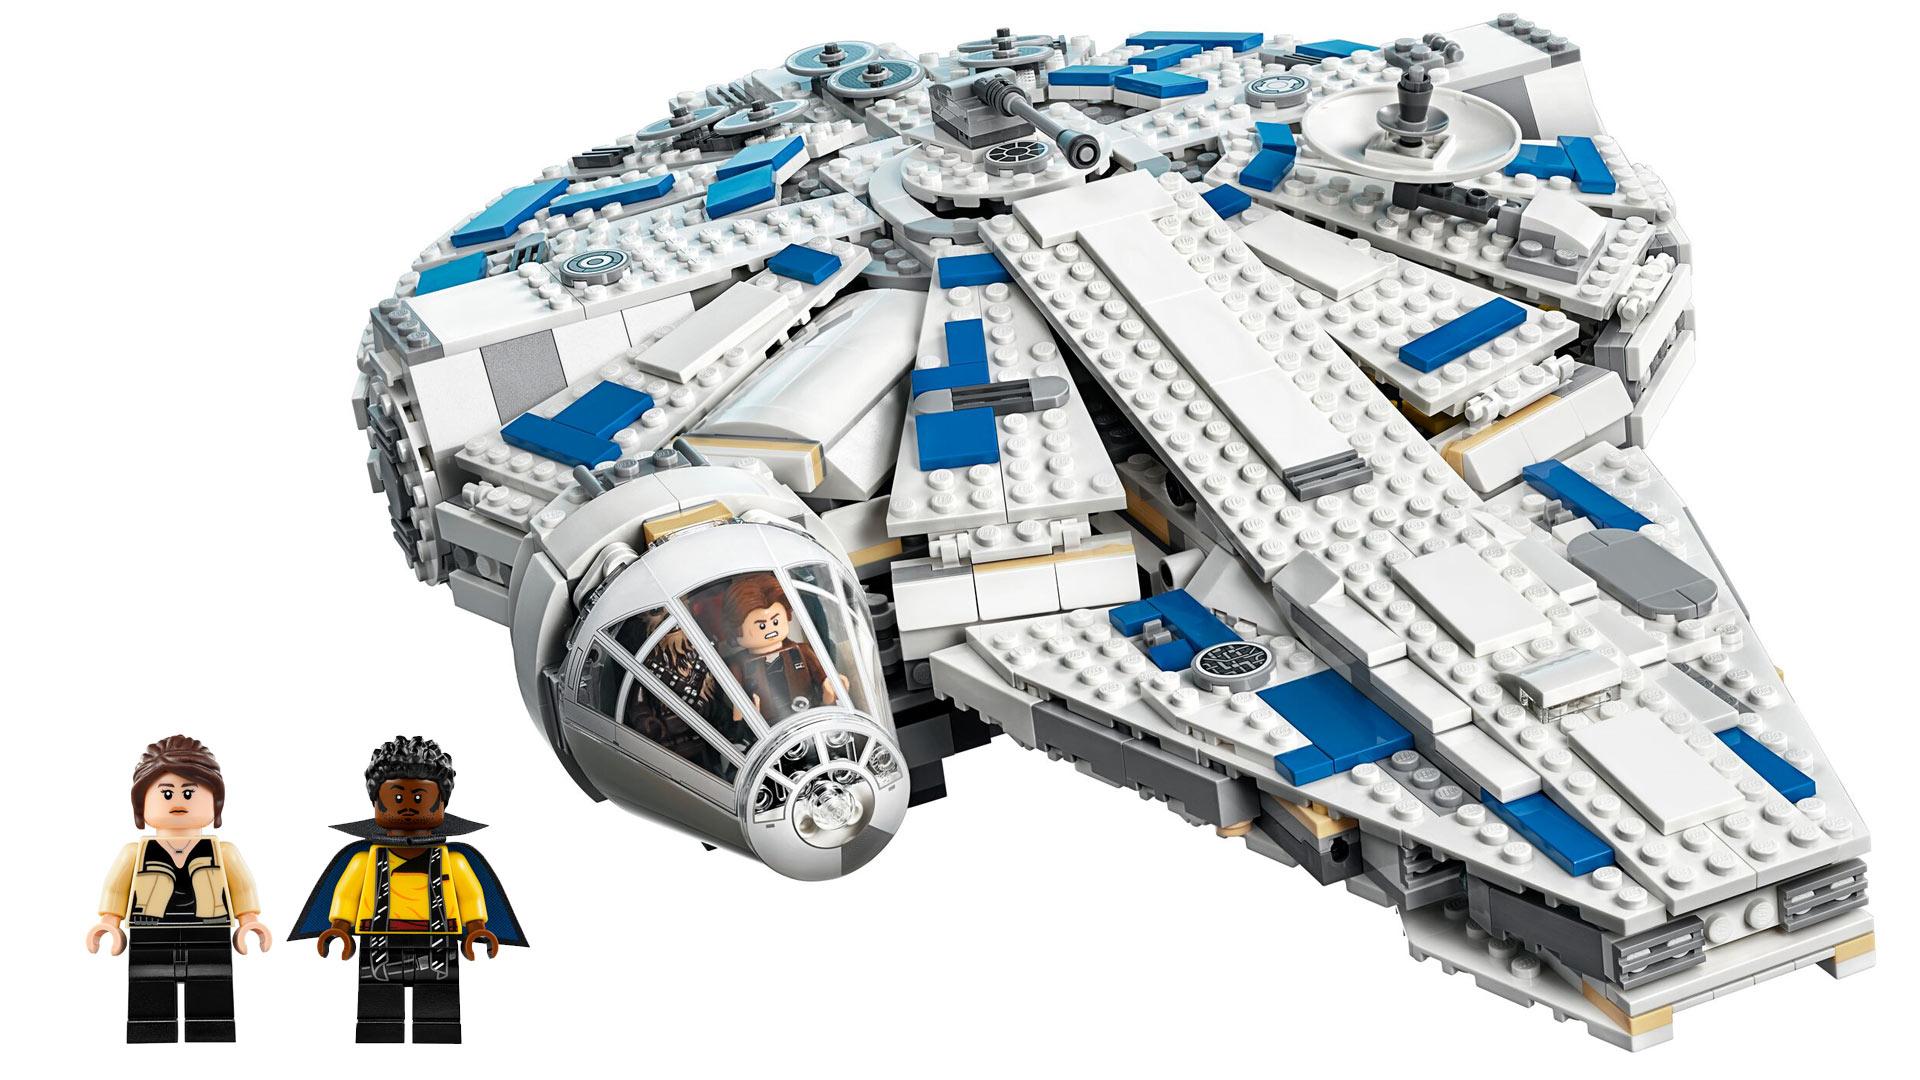 LEGO Star Wars Set 75212 Kessel Run Millennium Falcon at Toy Fair 2018